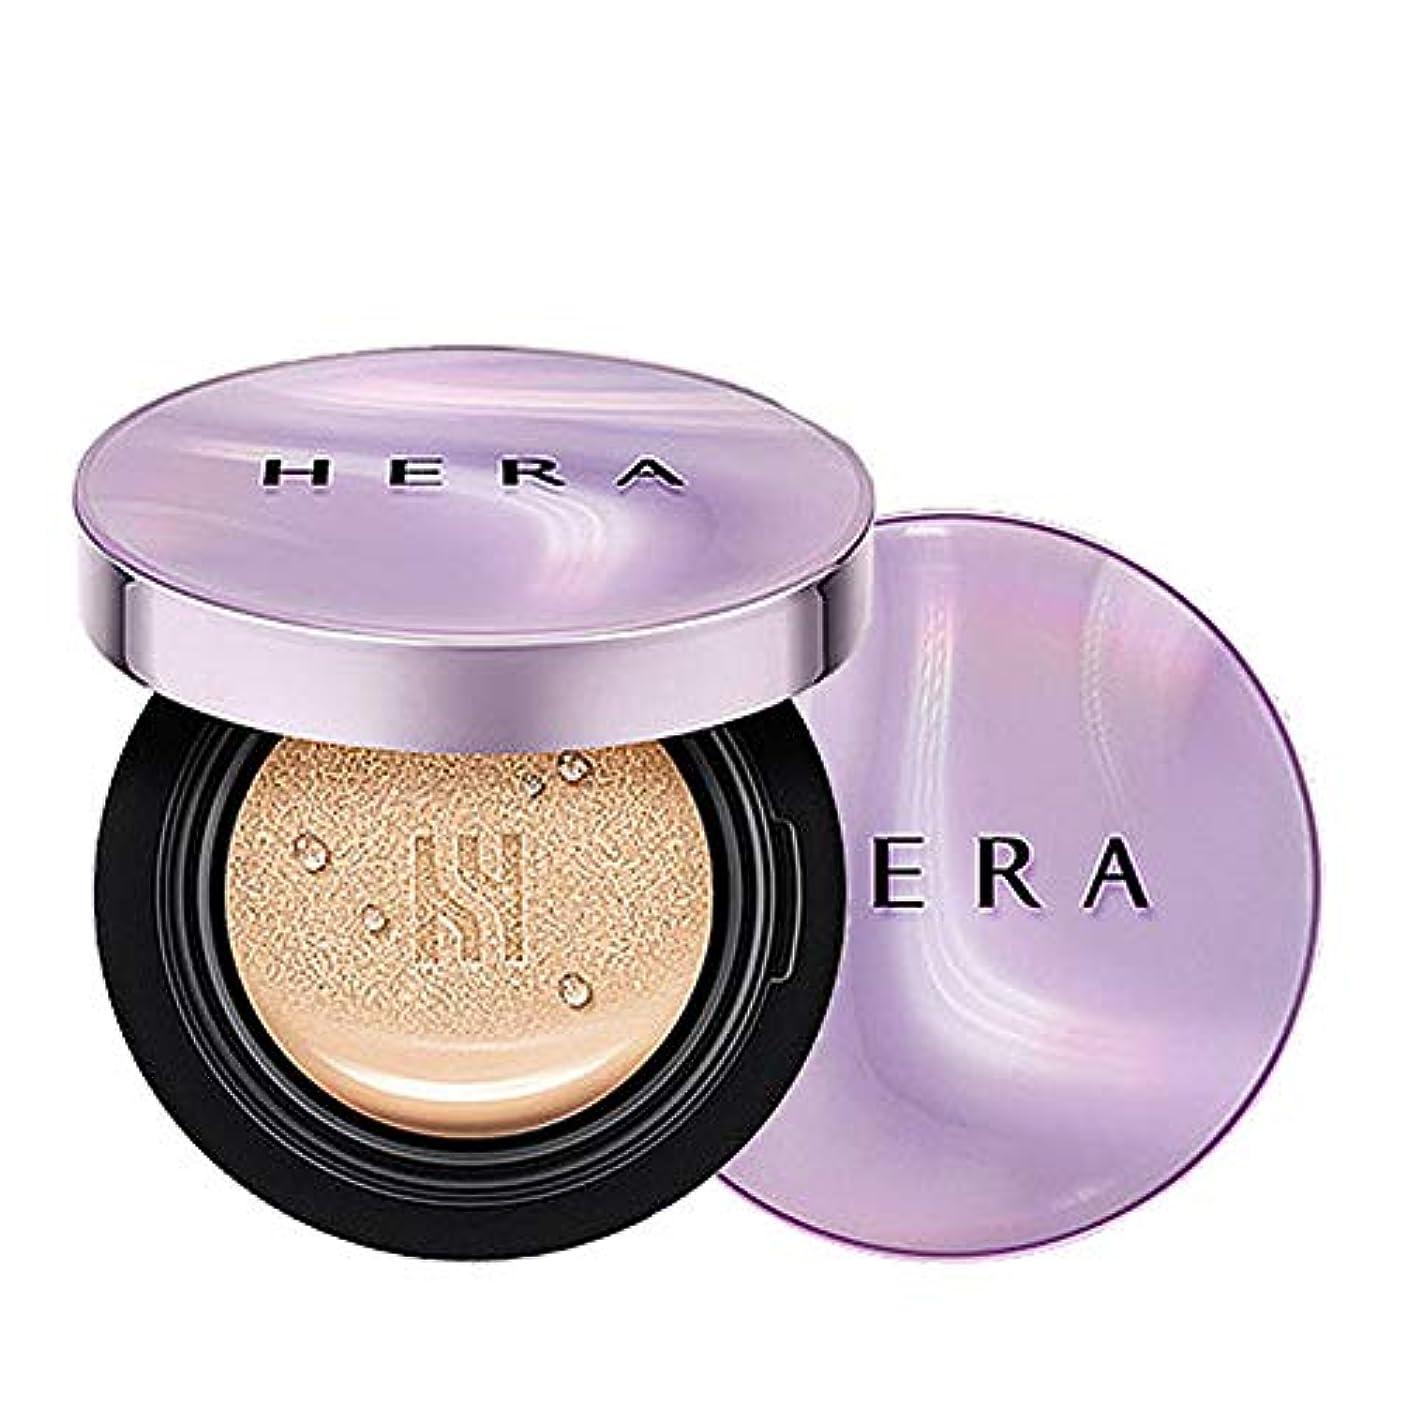 HERA(ヘラ) UVミストクッション ウルトラモイスチャー SPF34/PA++ [本品] (23号 ベージュ)